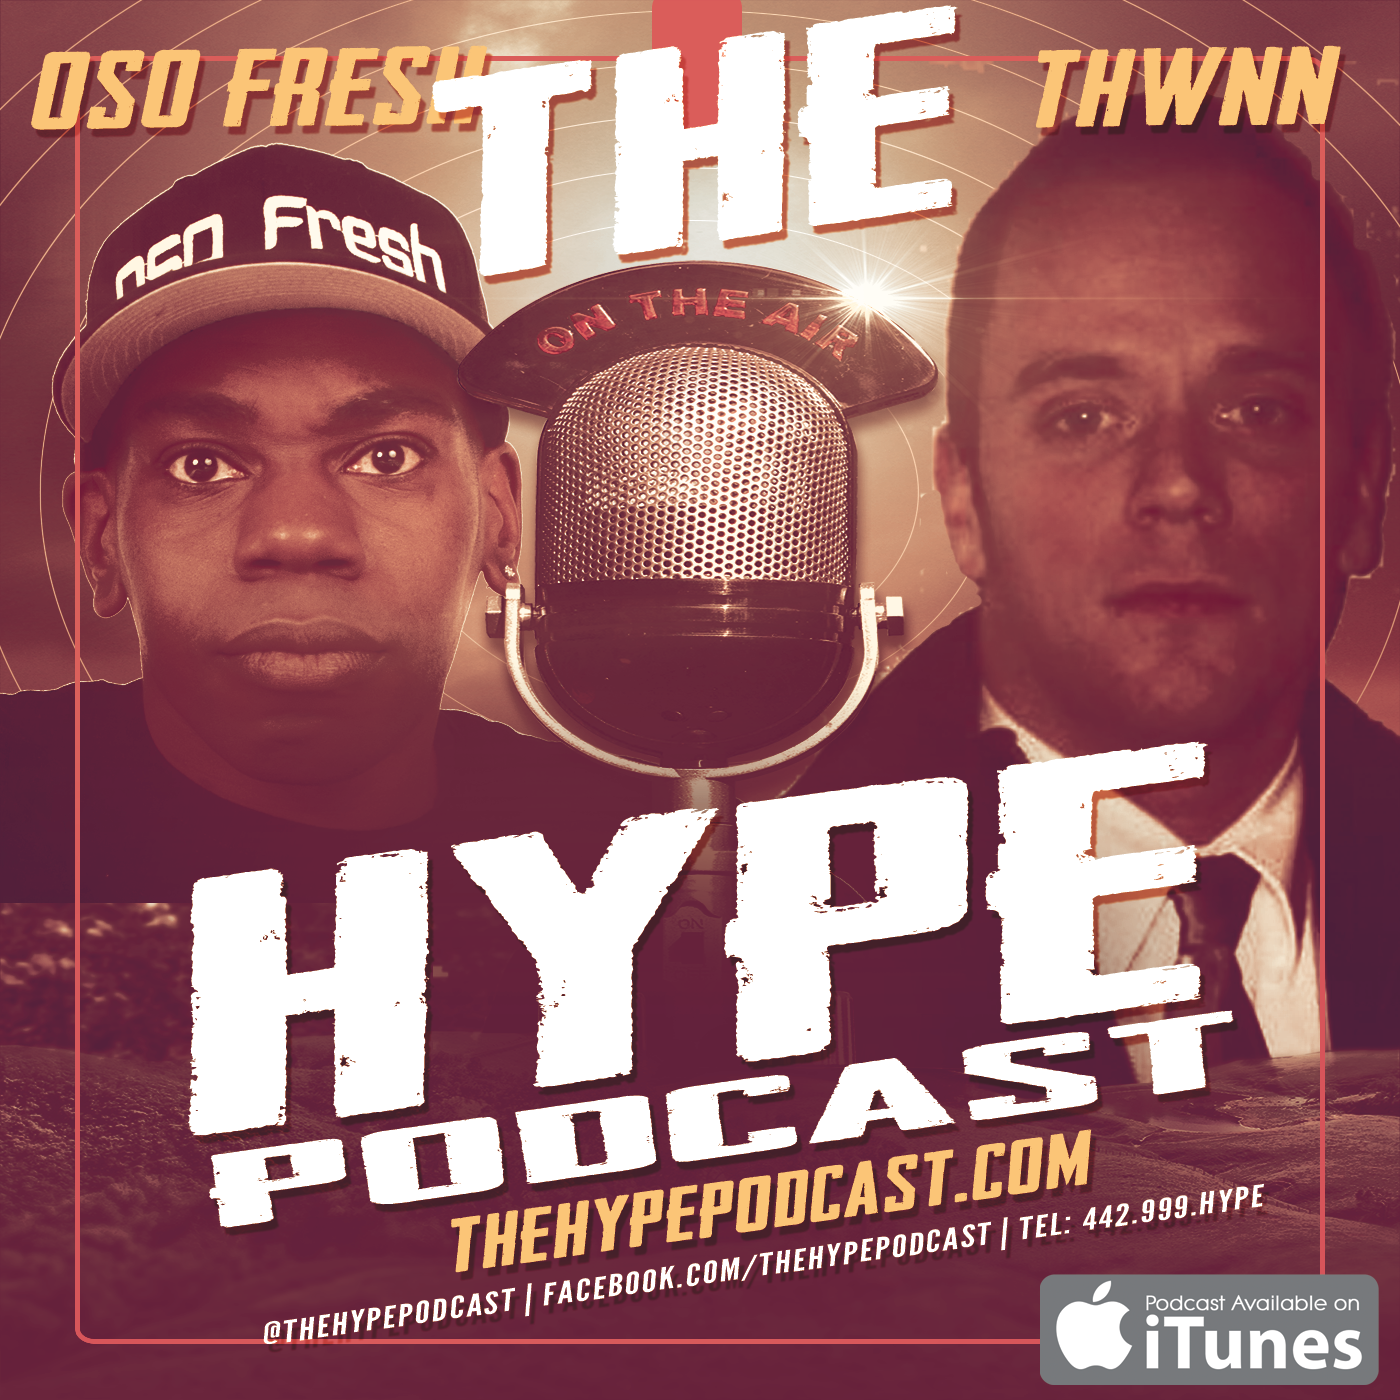 Artwork for hype podcast Episopde 1003